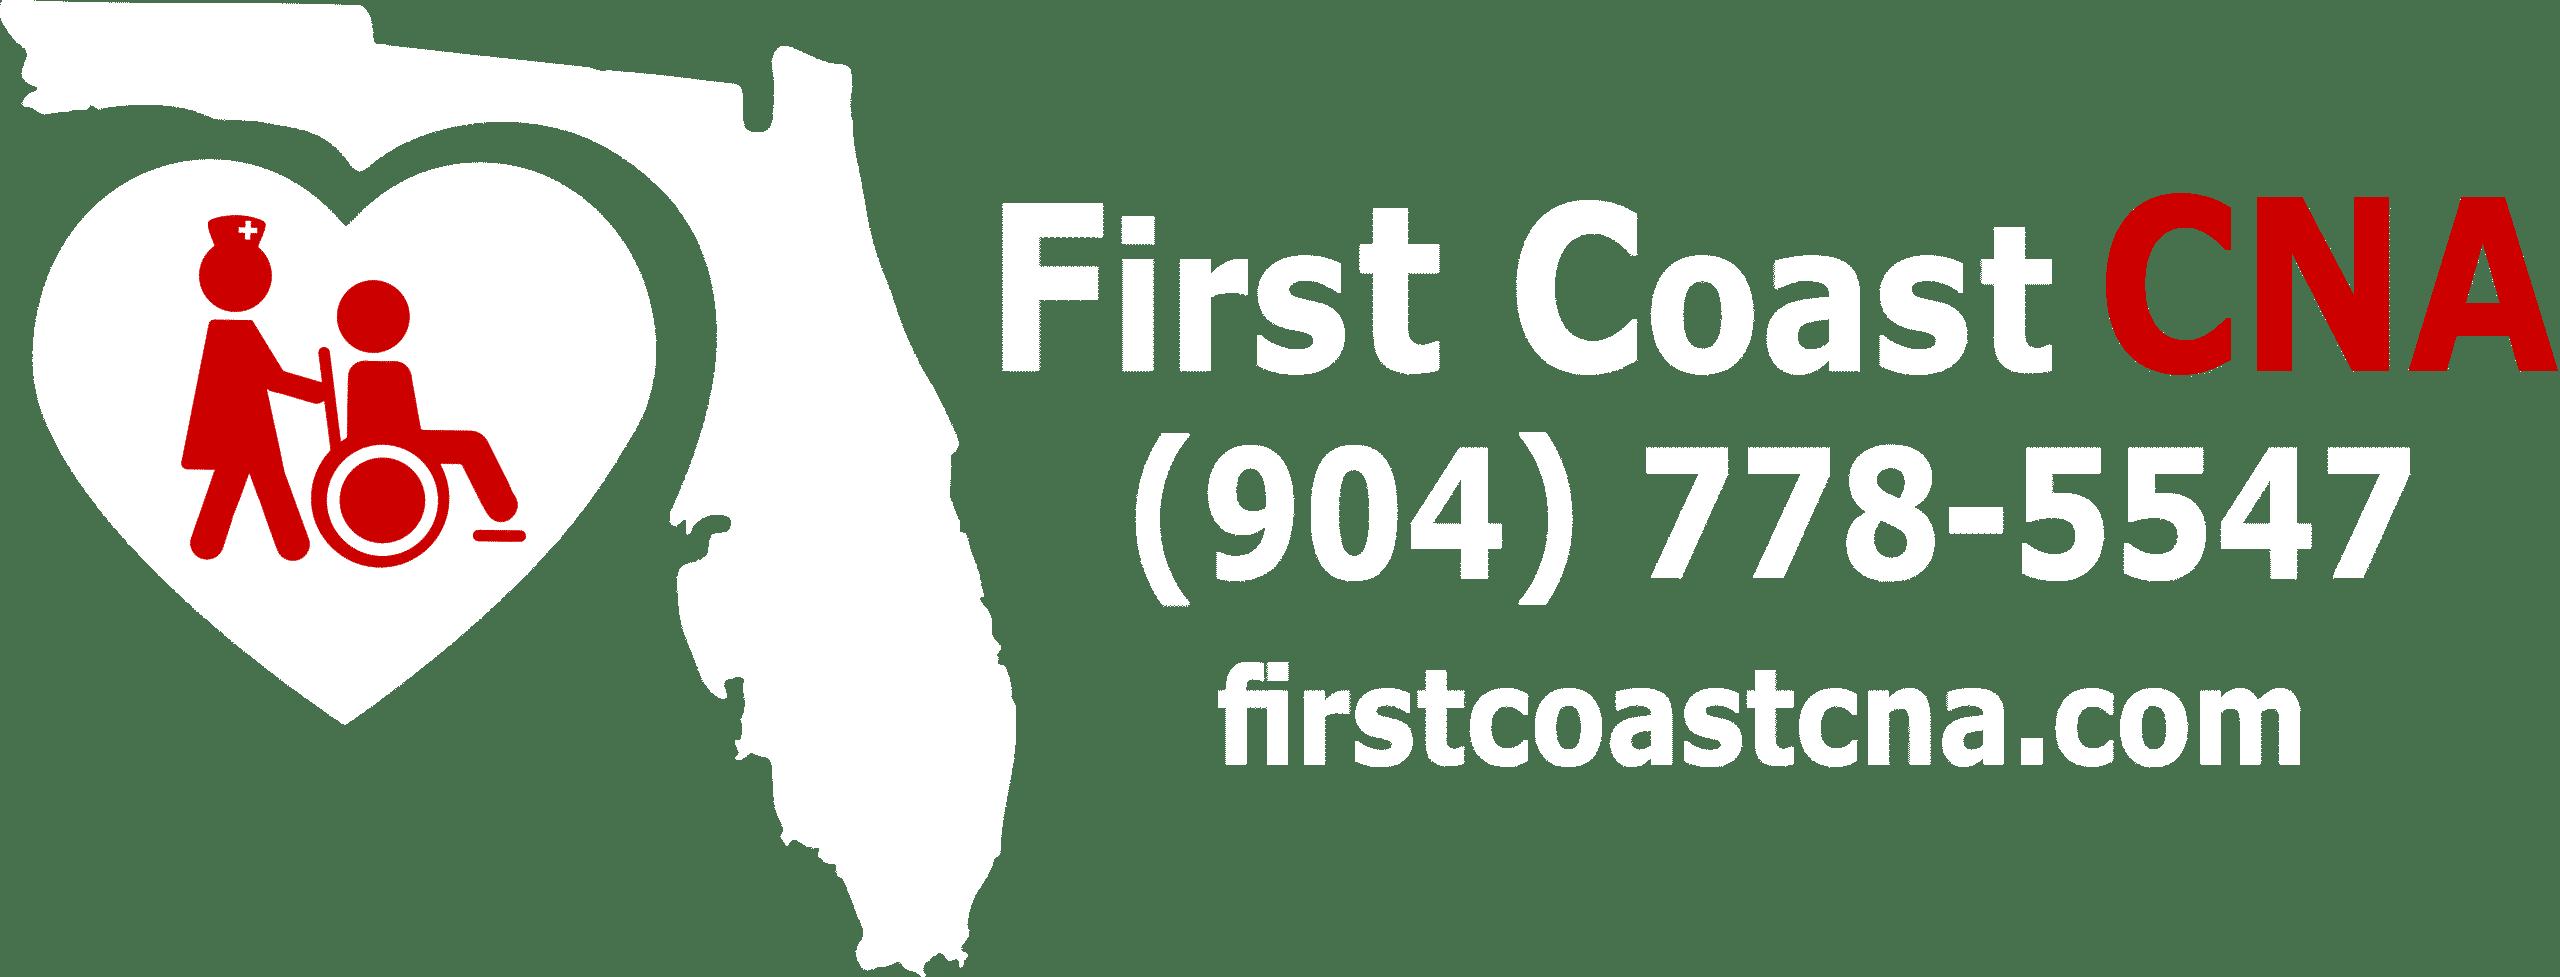 FCCNA Logo n wording White & Red Footer Transparent